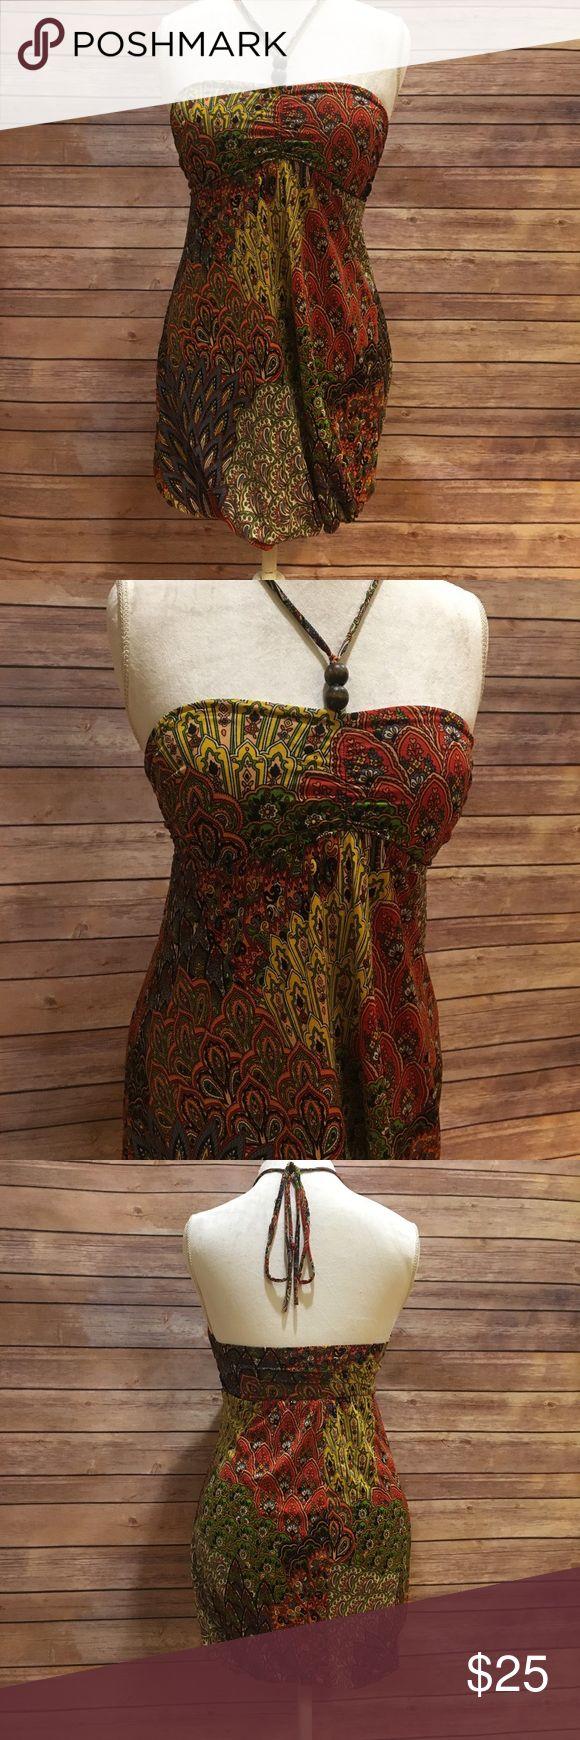 Bohemian Paisley Mini Halter Dress w/ wood beads S Gorgeous, Bold and Bright bohemian style Halter dress with tie Halter and two wood beads strung on tie. Mini dress. Festival Season, Burning Man! Dresses Mini